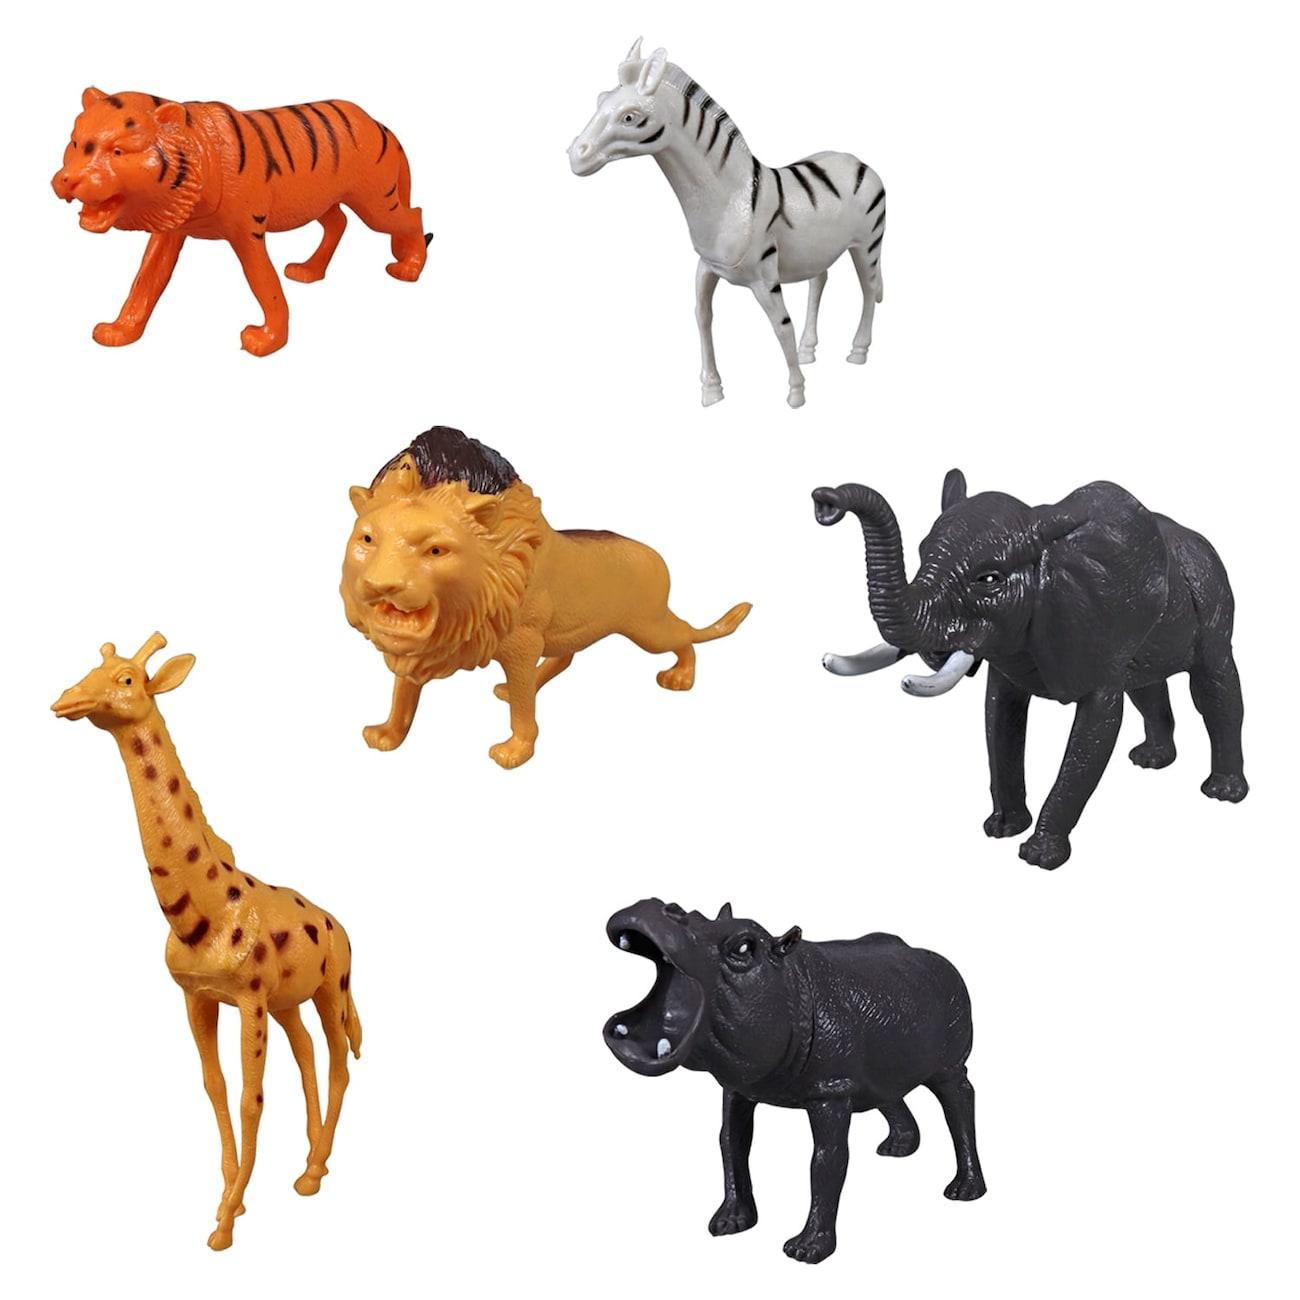 Plastic Safari Animal Figurines be3be66bc8